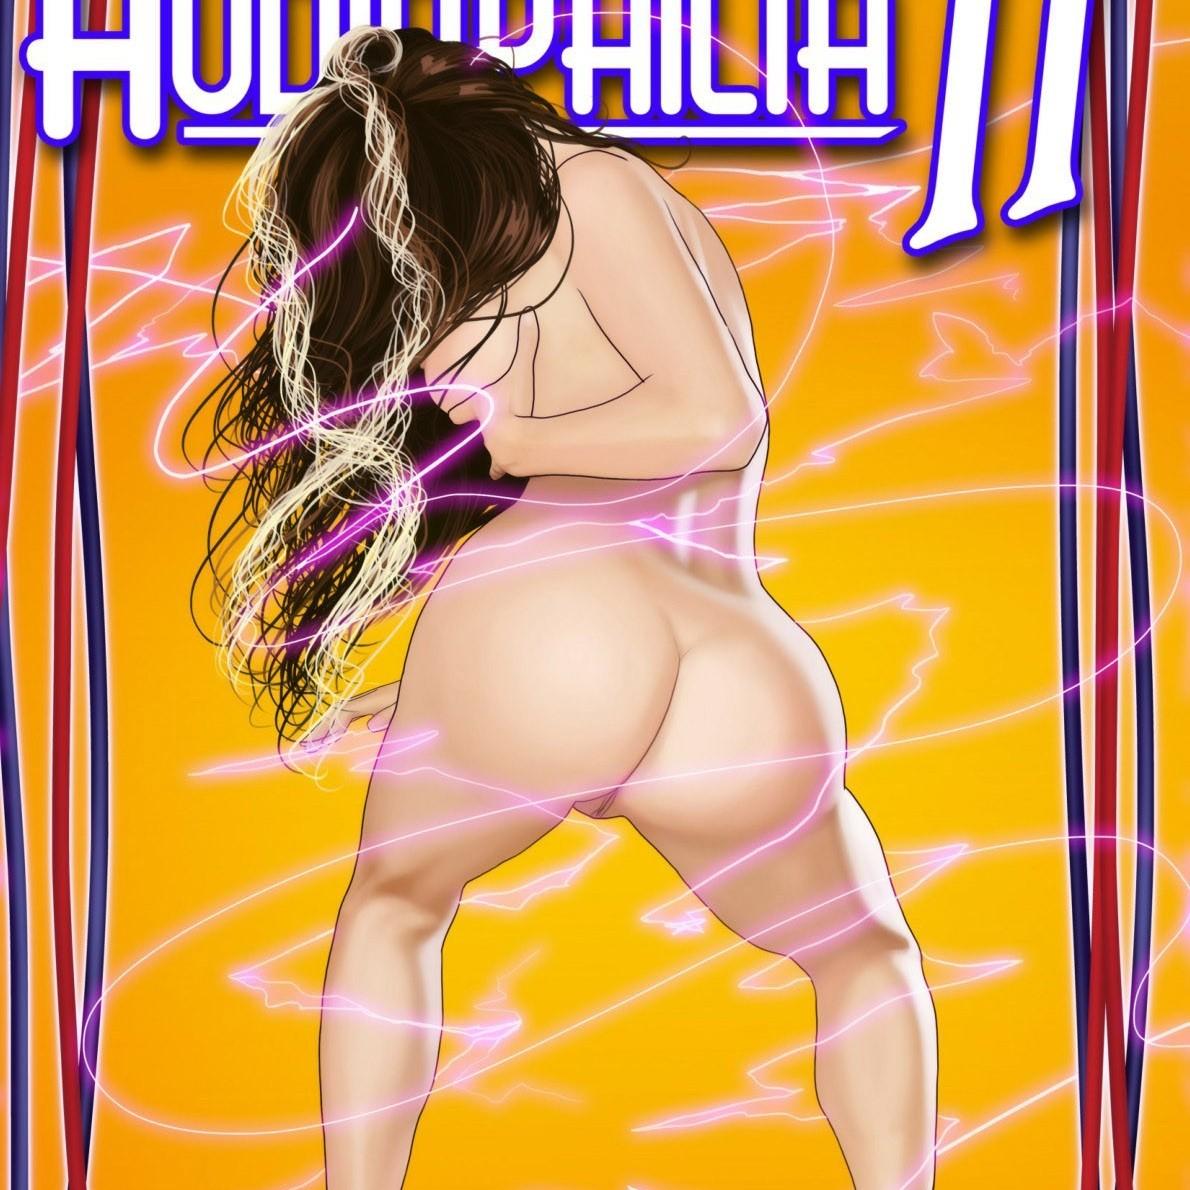 comic eroticos v1